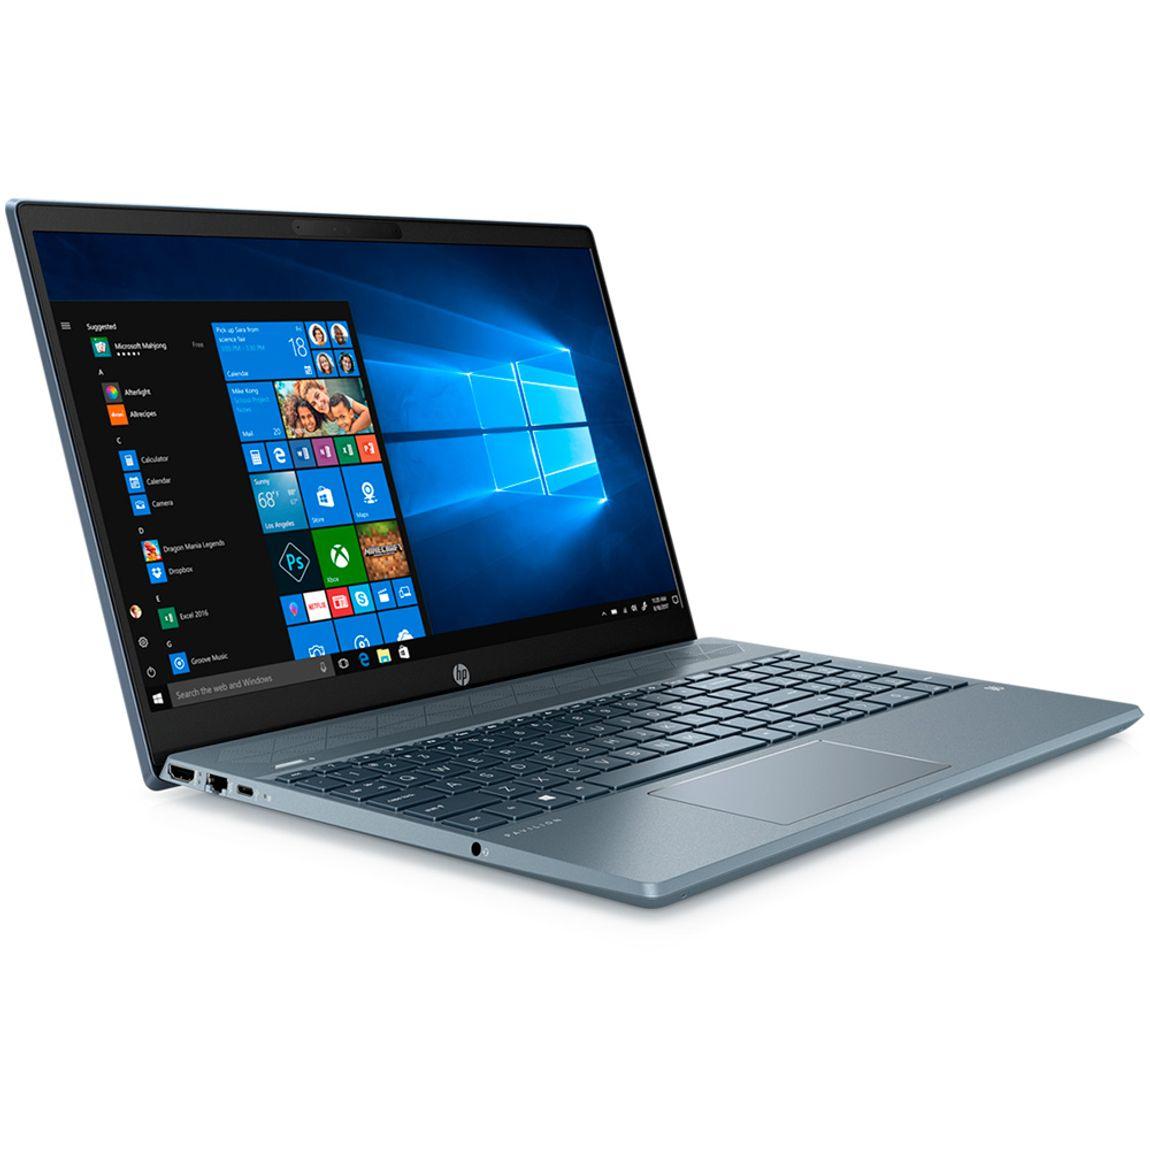 Officemax: LAPTOP HP Pavilion 15-cw1011la AMD Ryzen 5 3500U 8GB 256GB